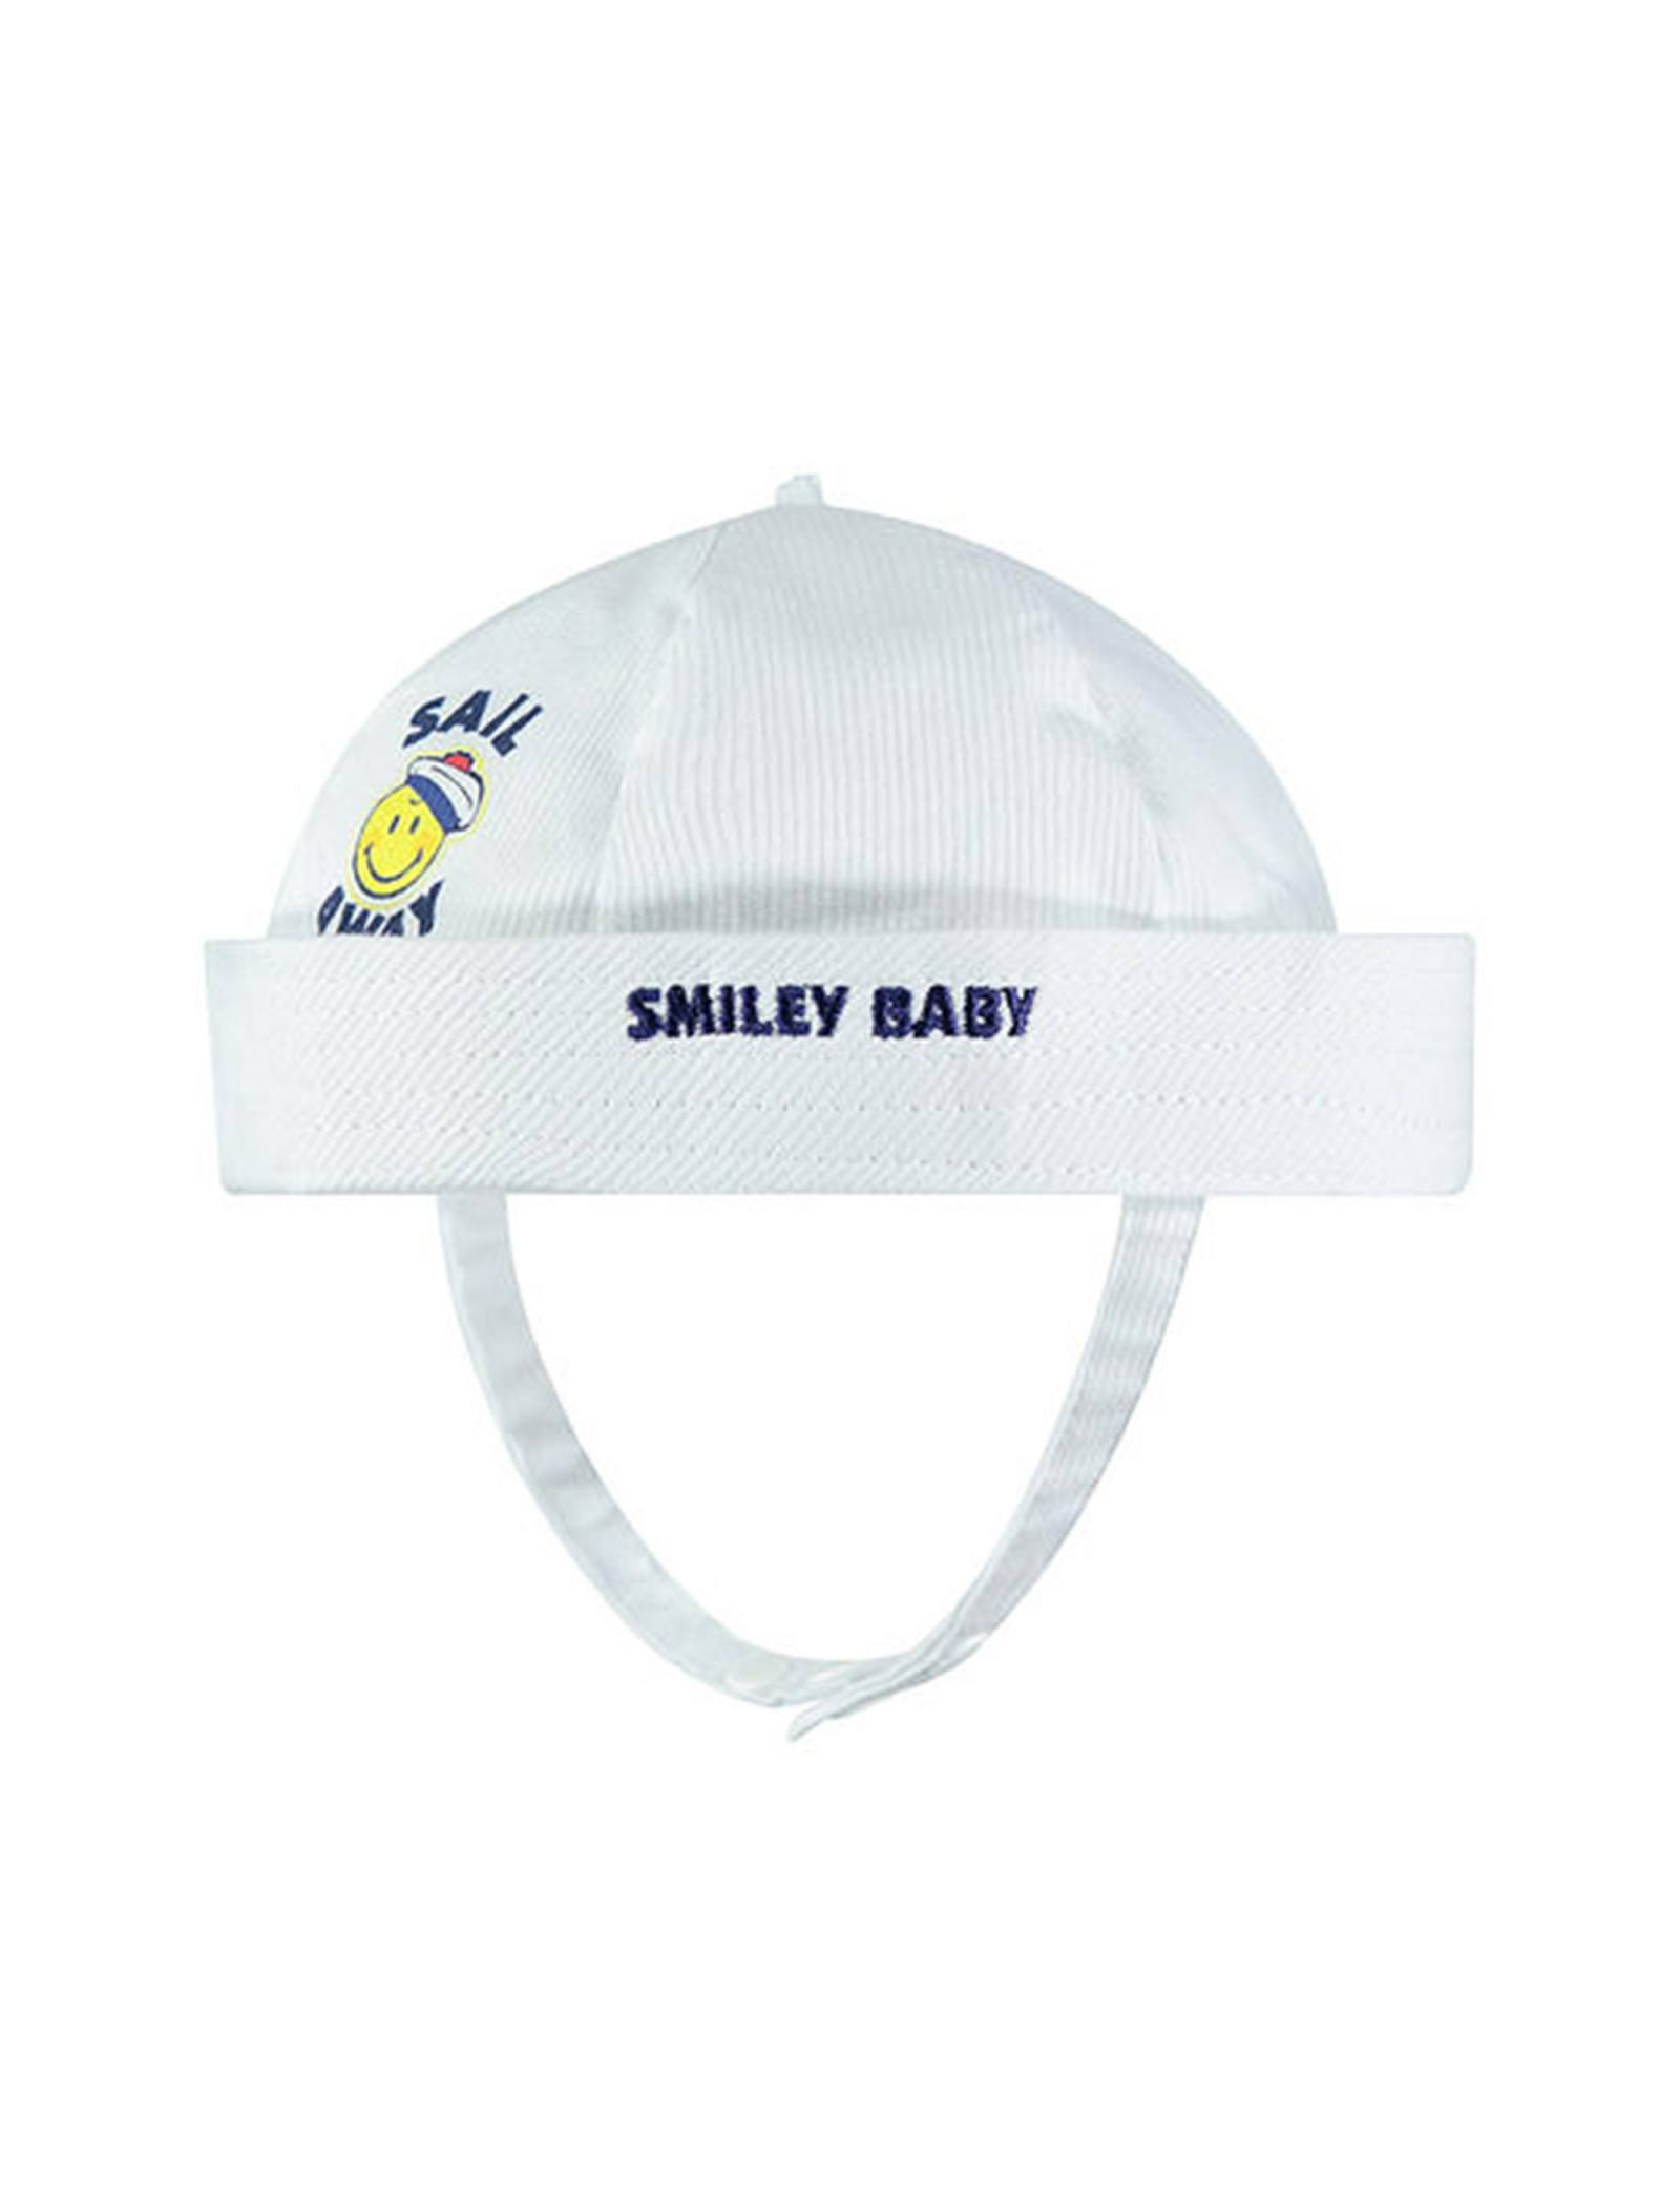 کلاه نخی نوزادی پسرانه - ارکسترا - سفيد - 1